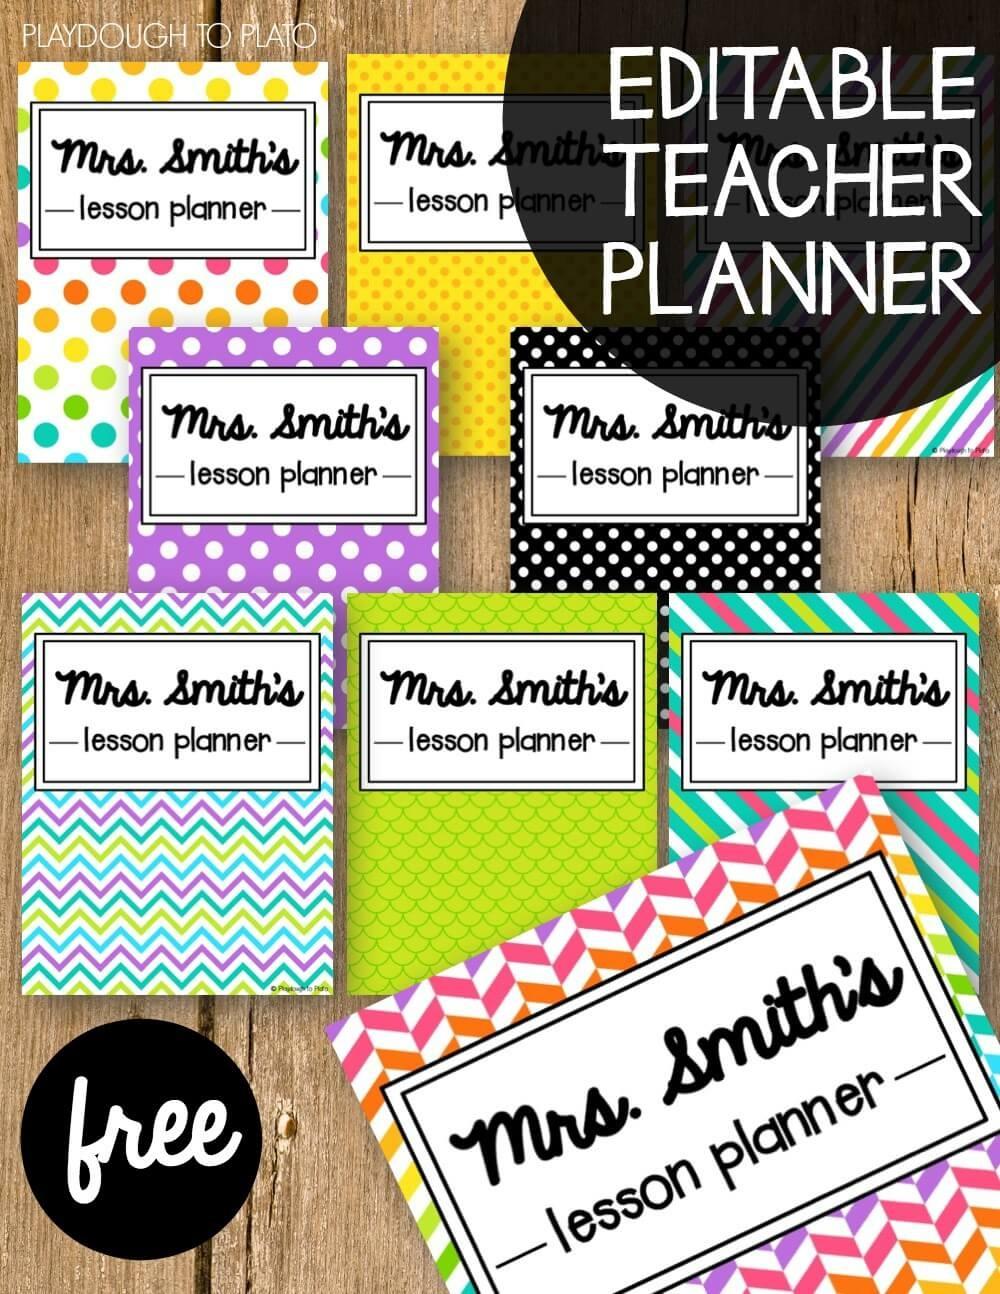 Free Teacher Planner - Playdough To Plato - Free Printable Teacher Binder Covers